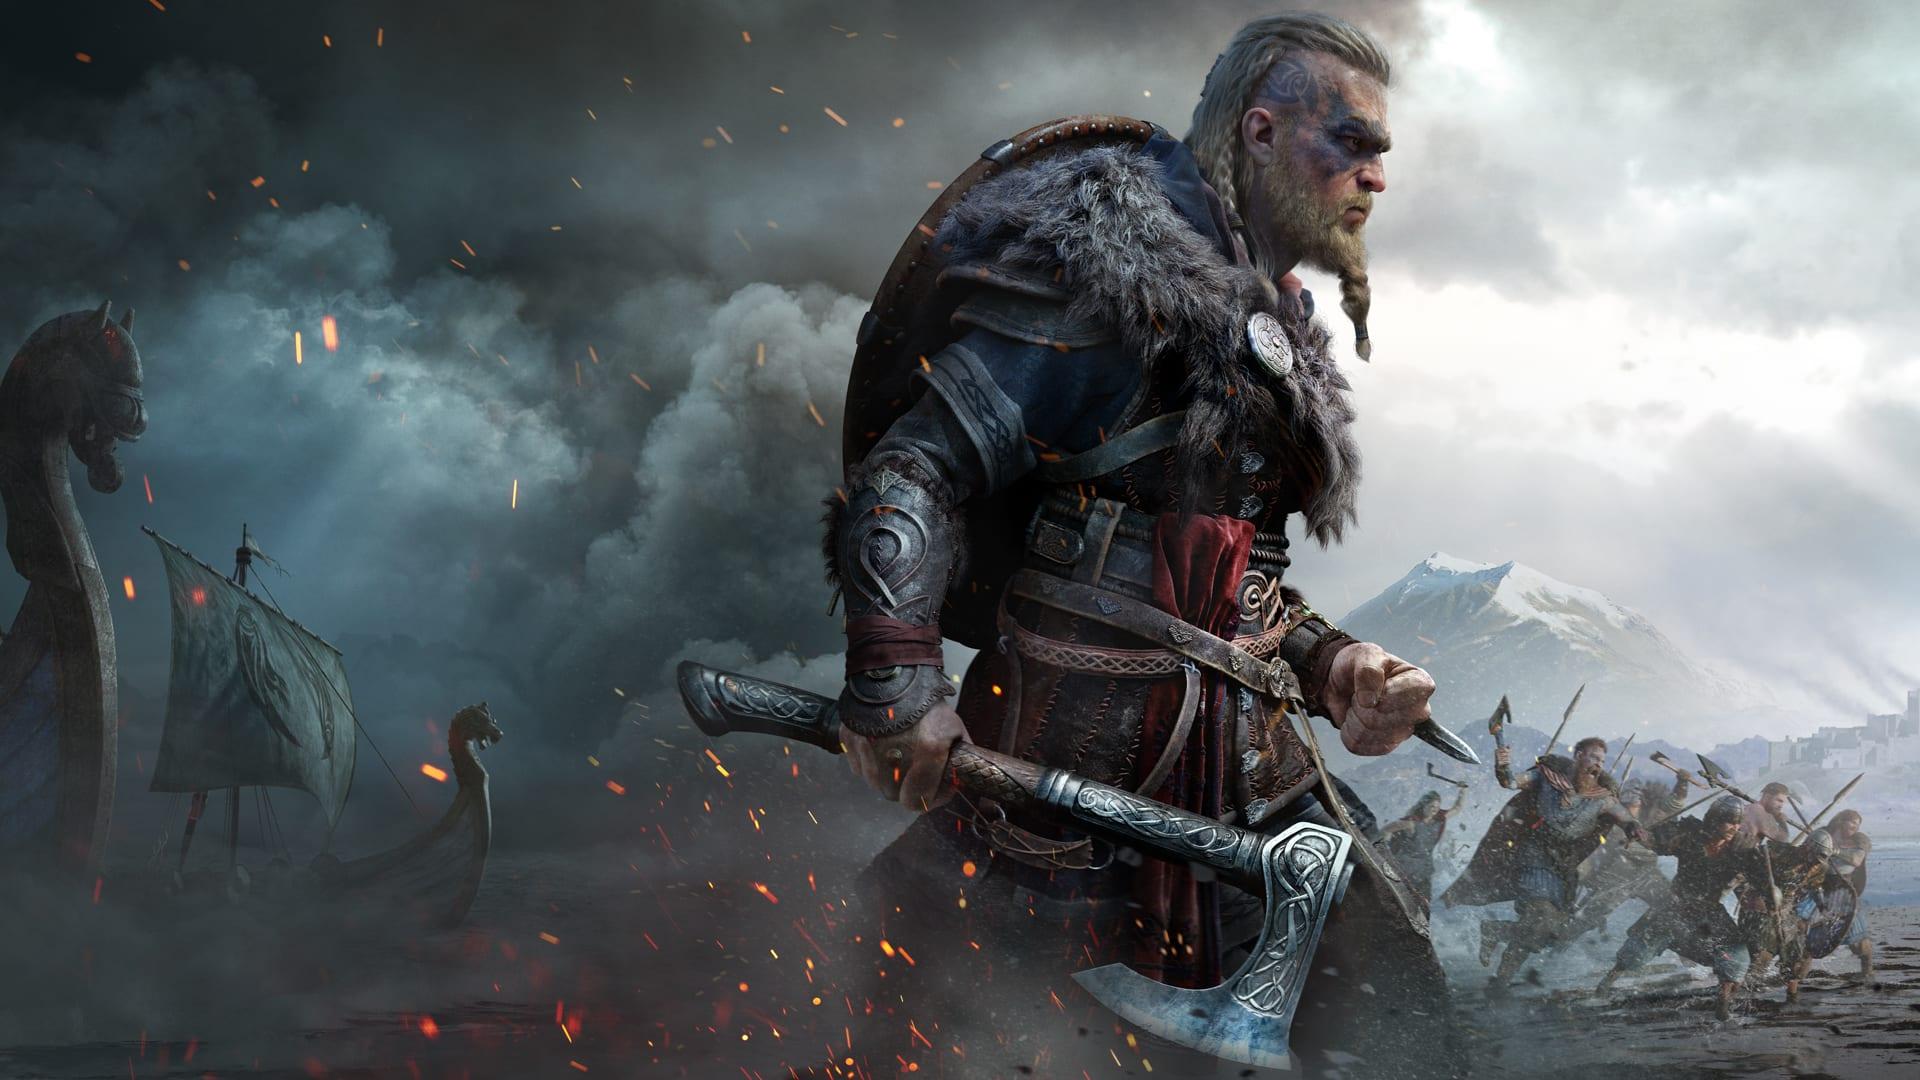 assassins creed valhalla story